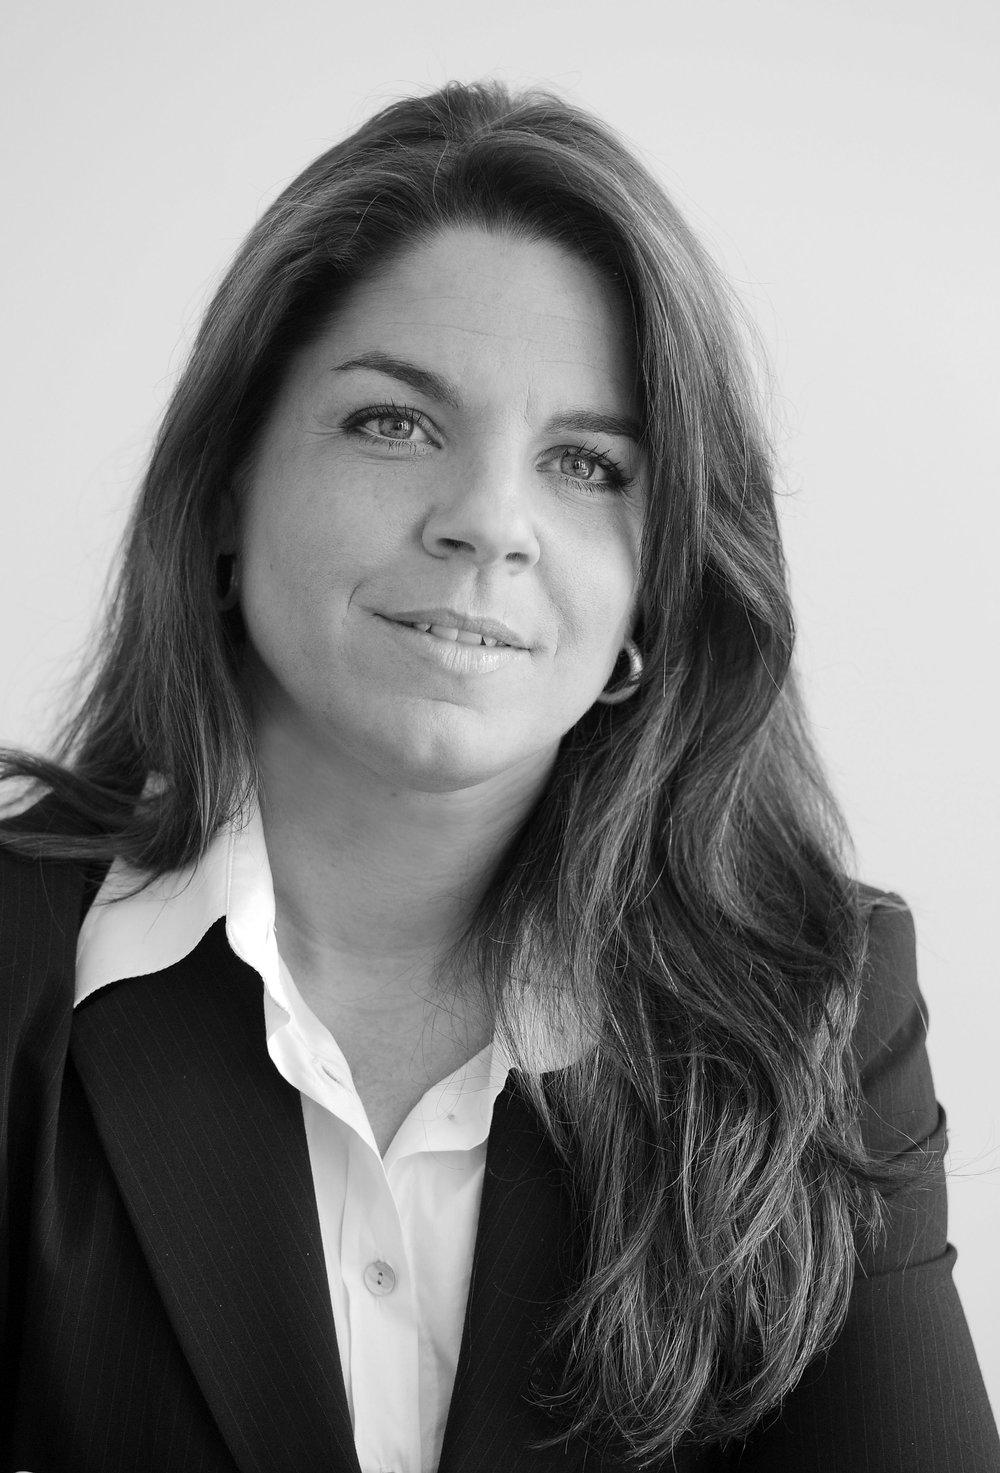 Daniela Leeb